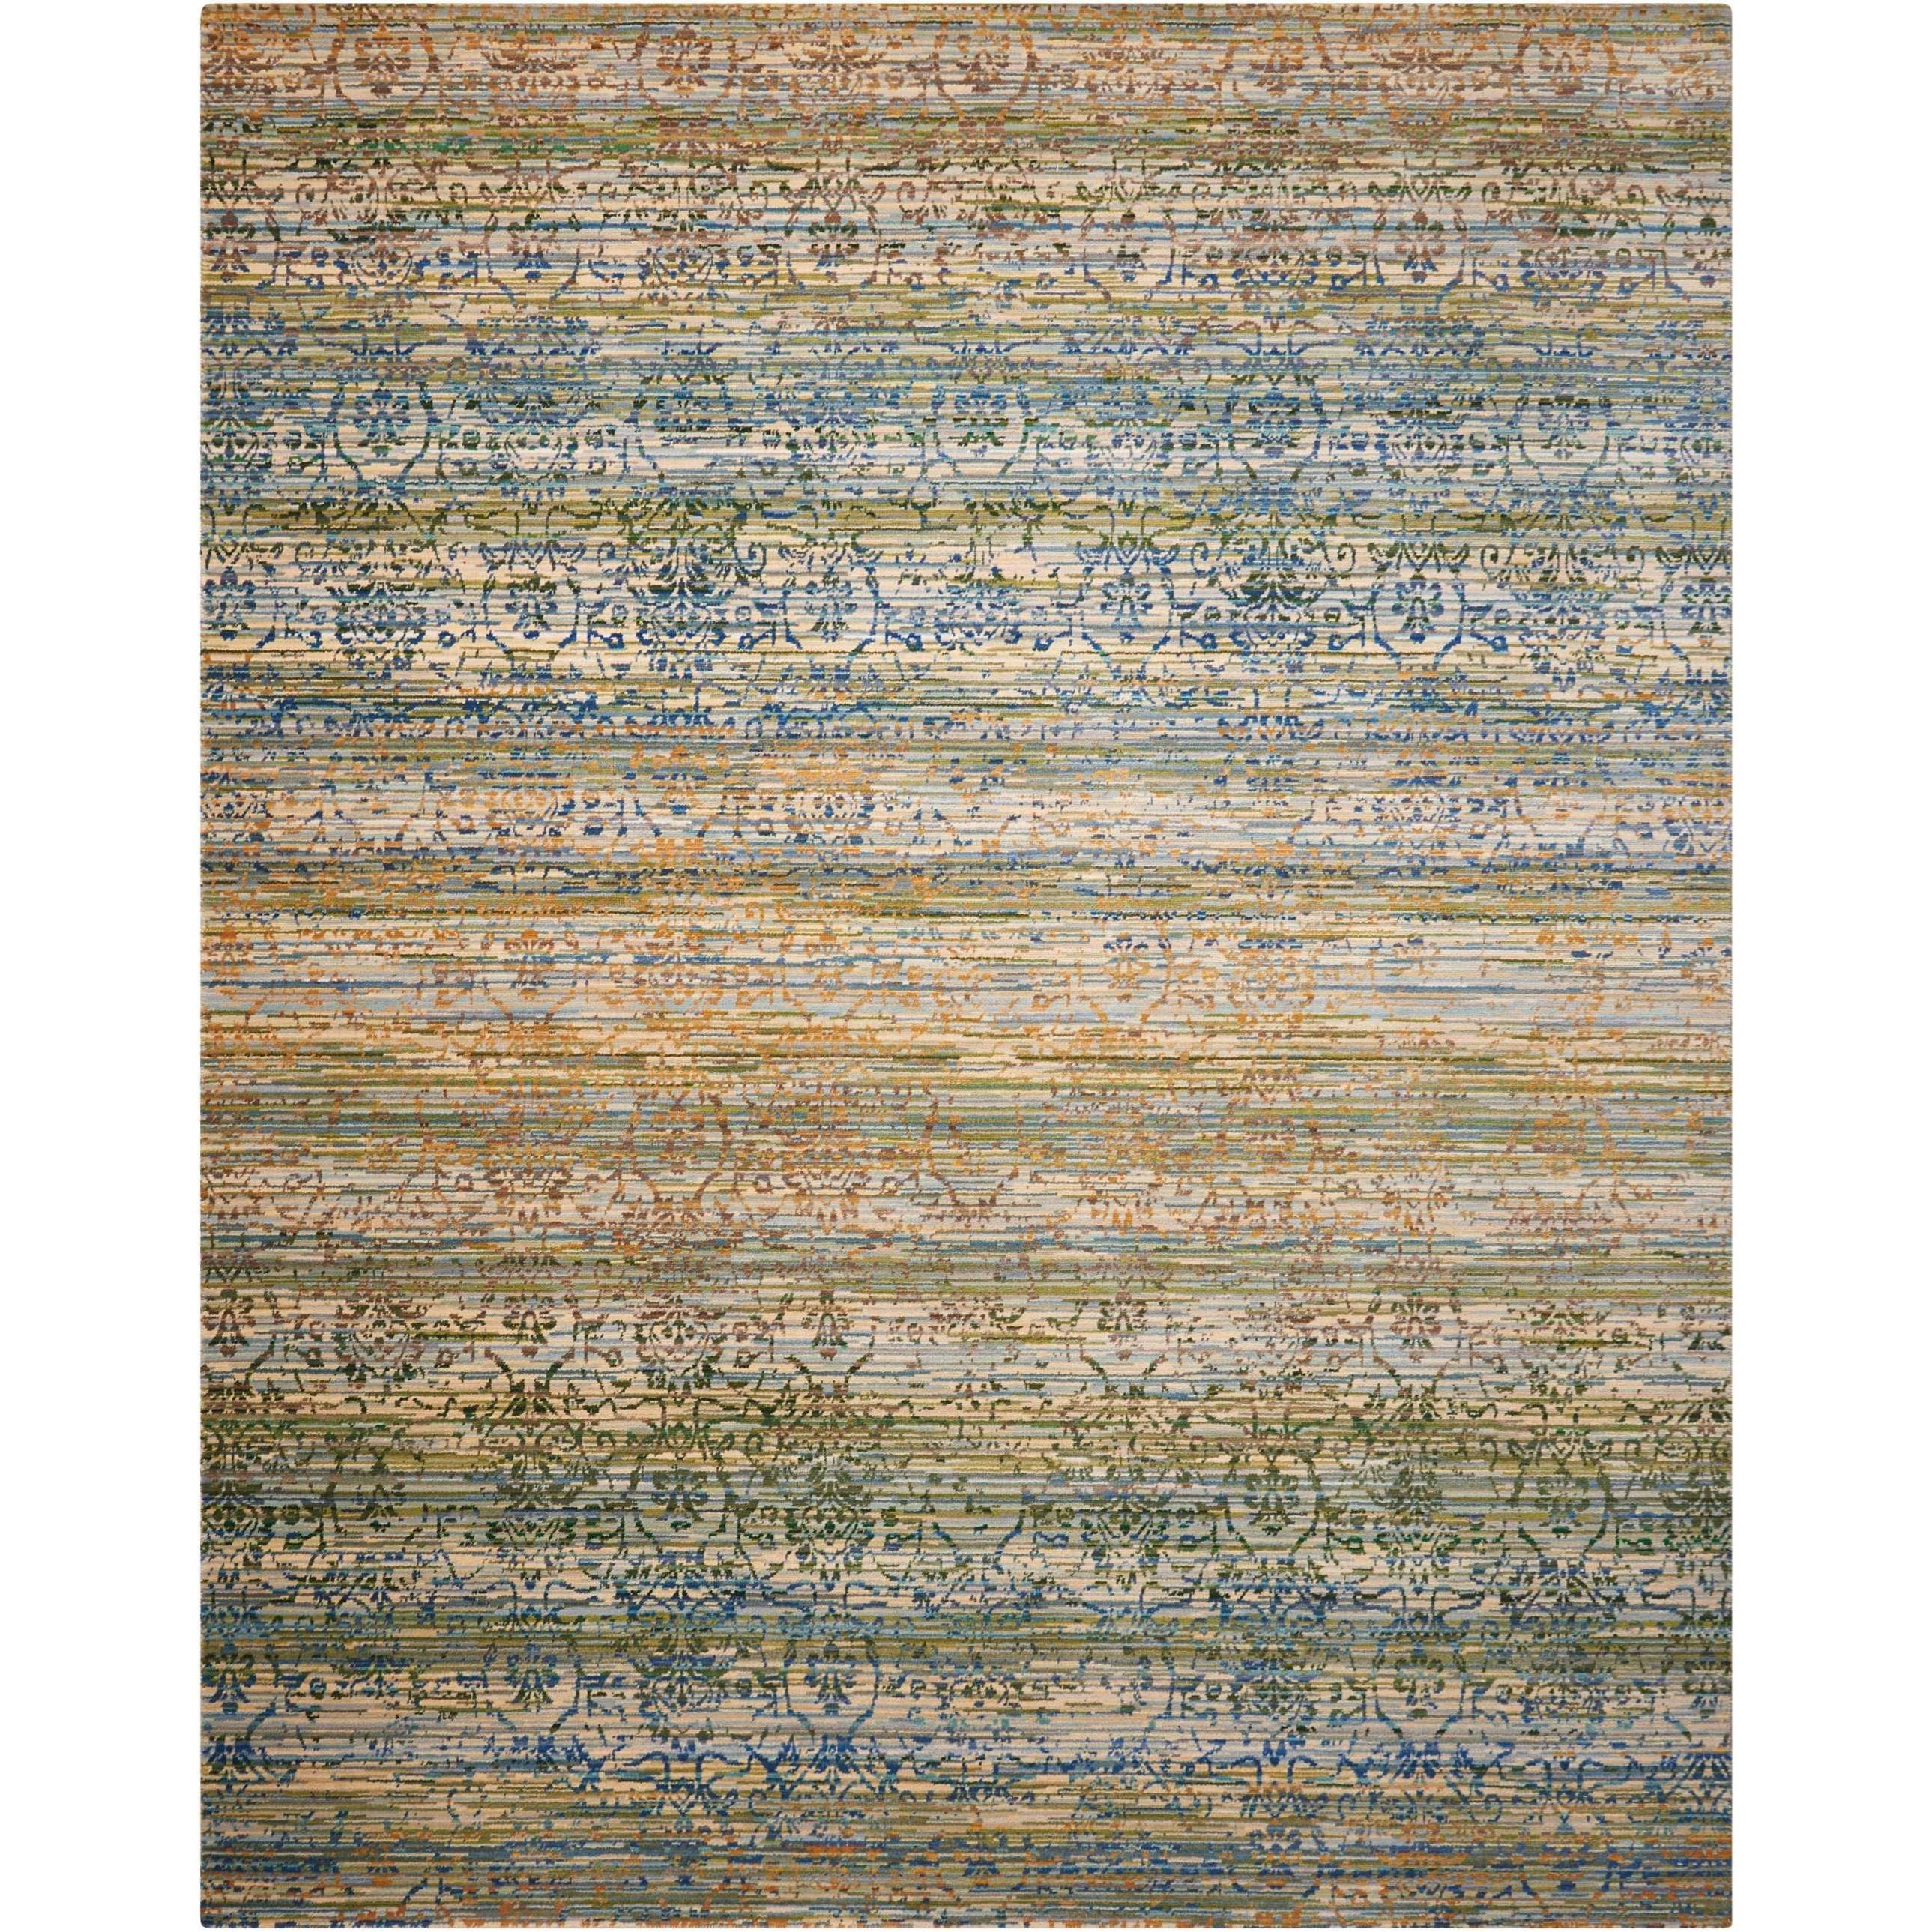 "Rhapsody 7'9"" x 9'9"" Beige Blue Rectangle Rug by Nourison at Sprintz Furniture"